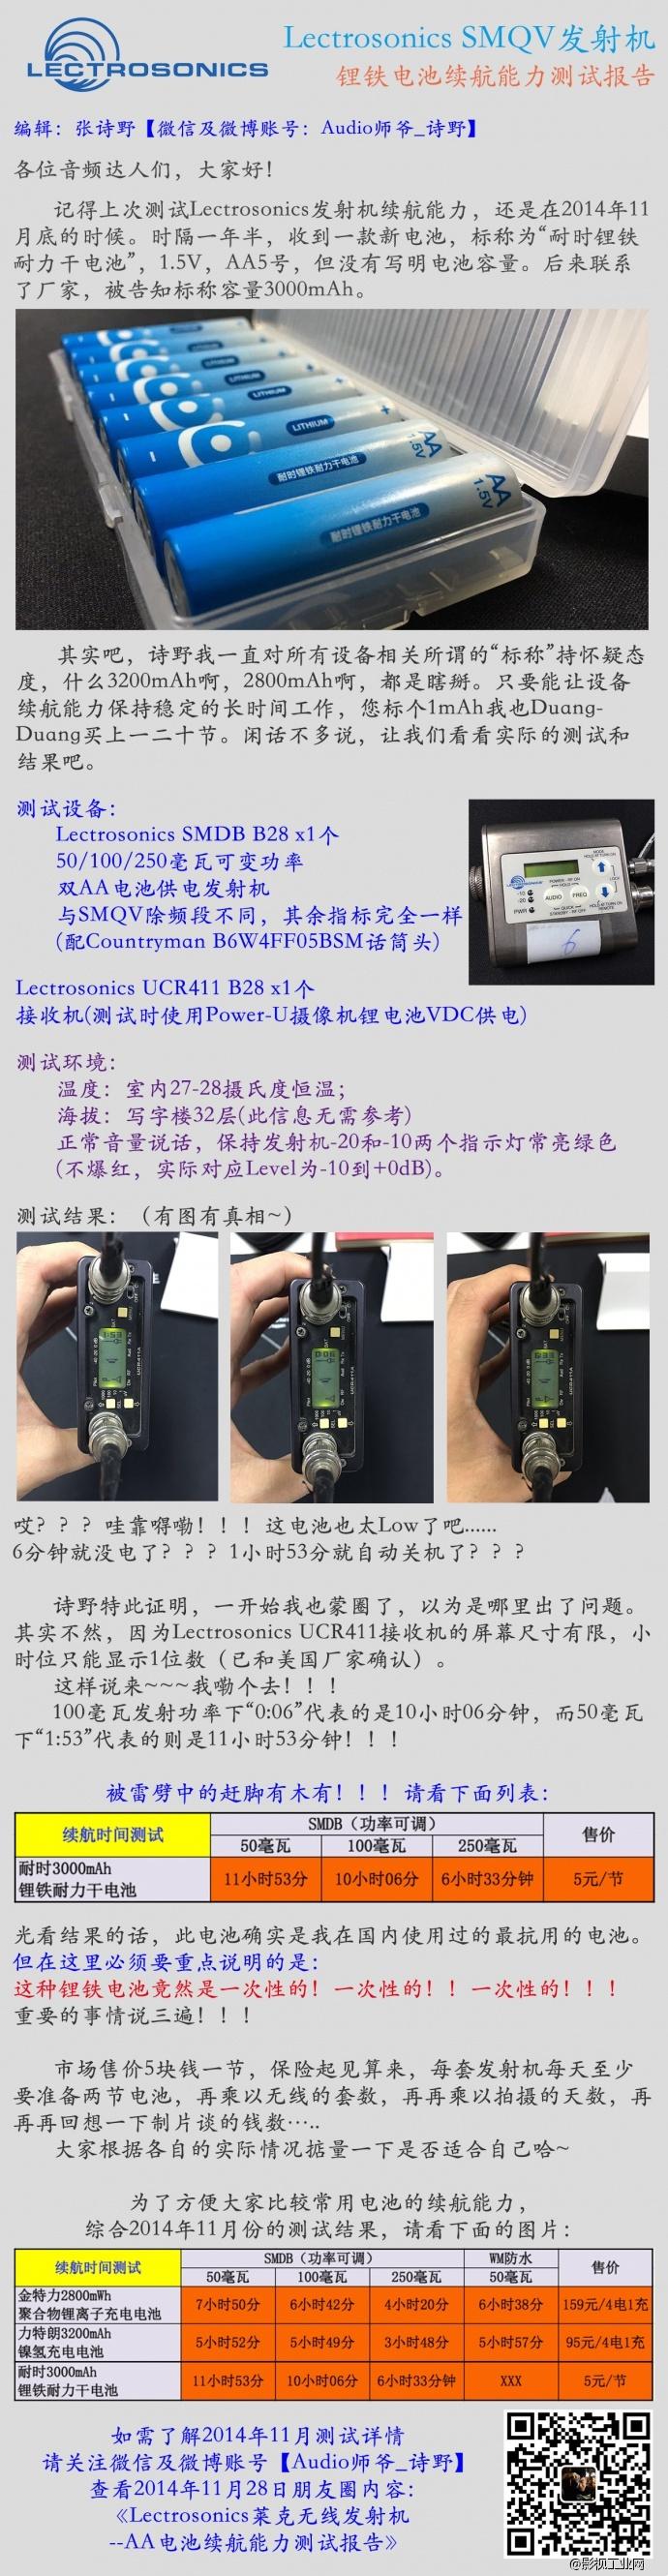 Lectrosonics SMQV发射机航能力测试报告 by Audio诗野